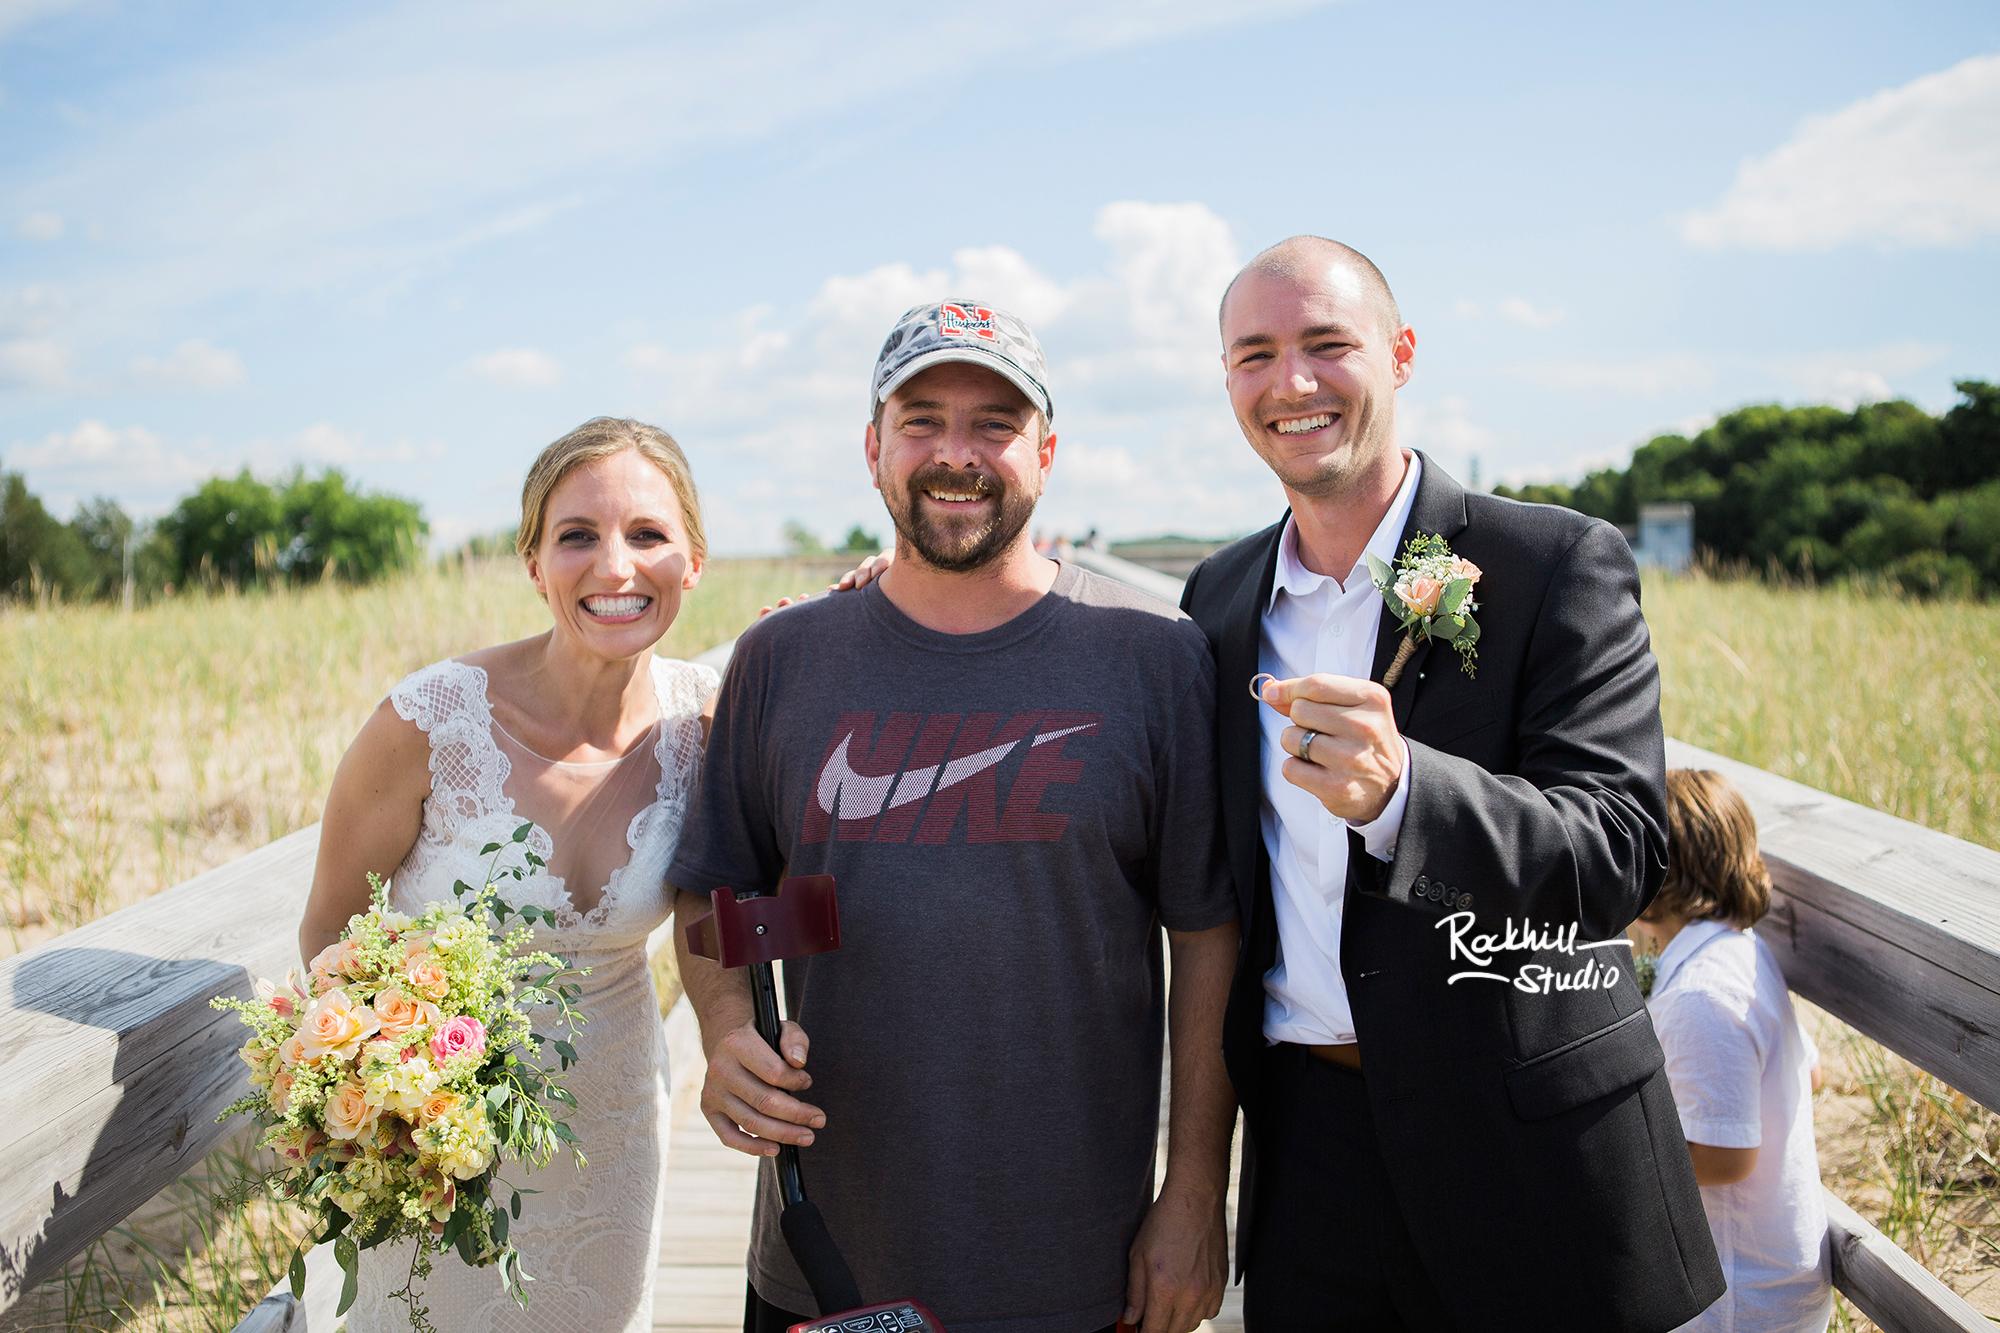 grand-marais-wedding-photography-upper-peninsula-northern-michigan-rockhill-44.jpg